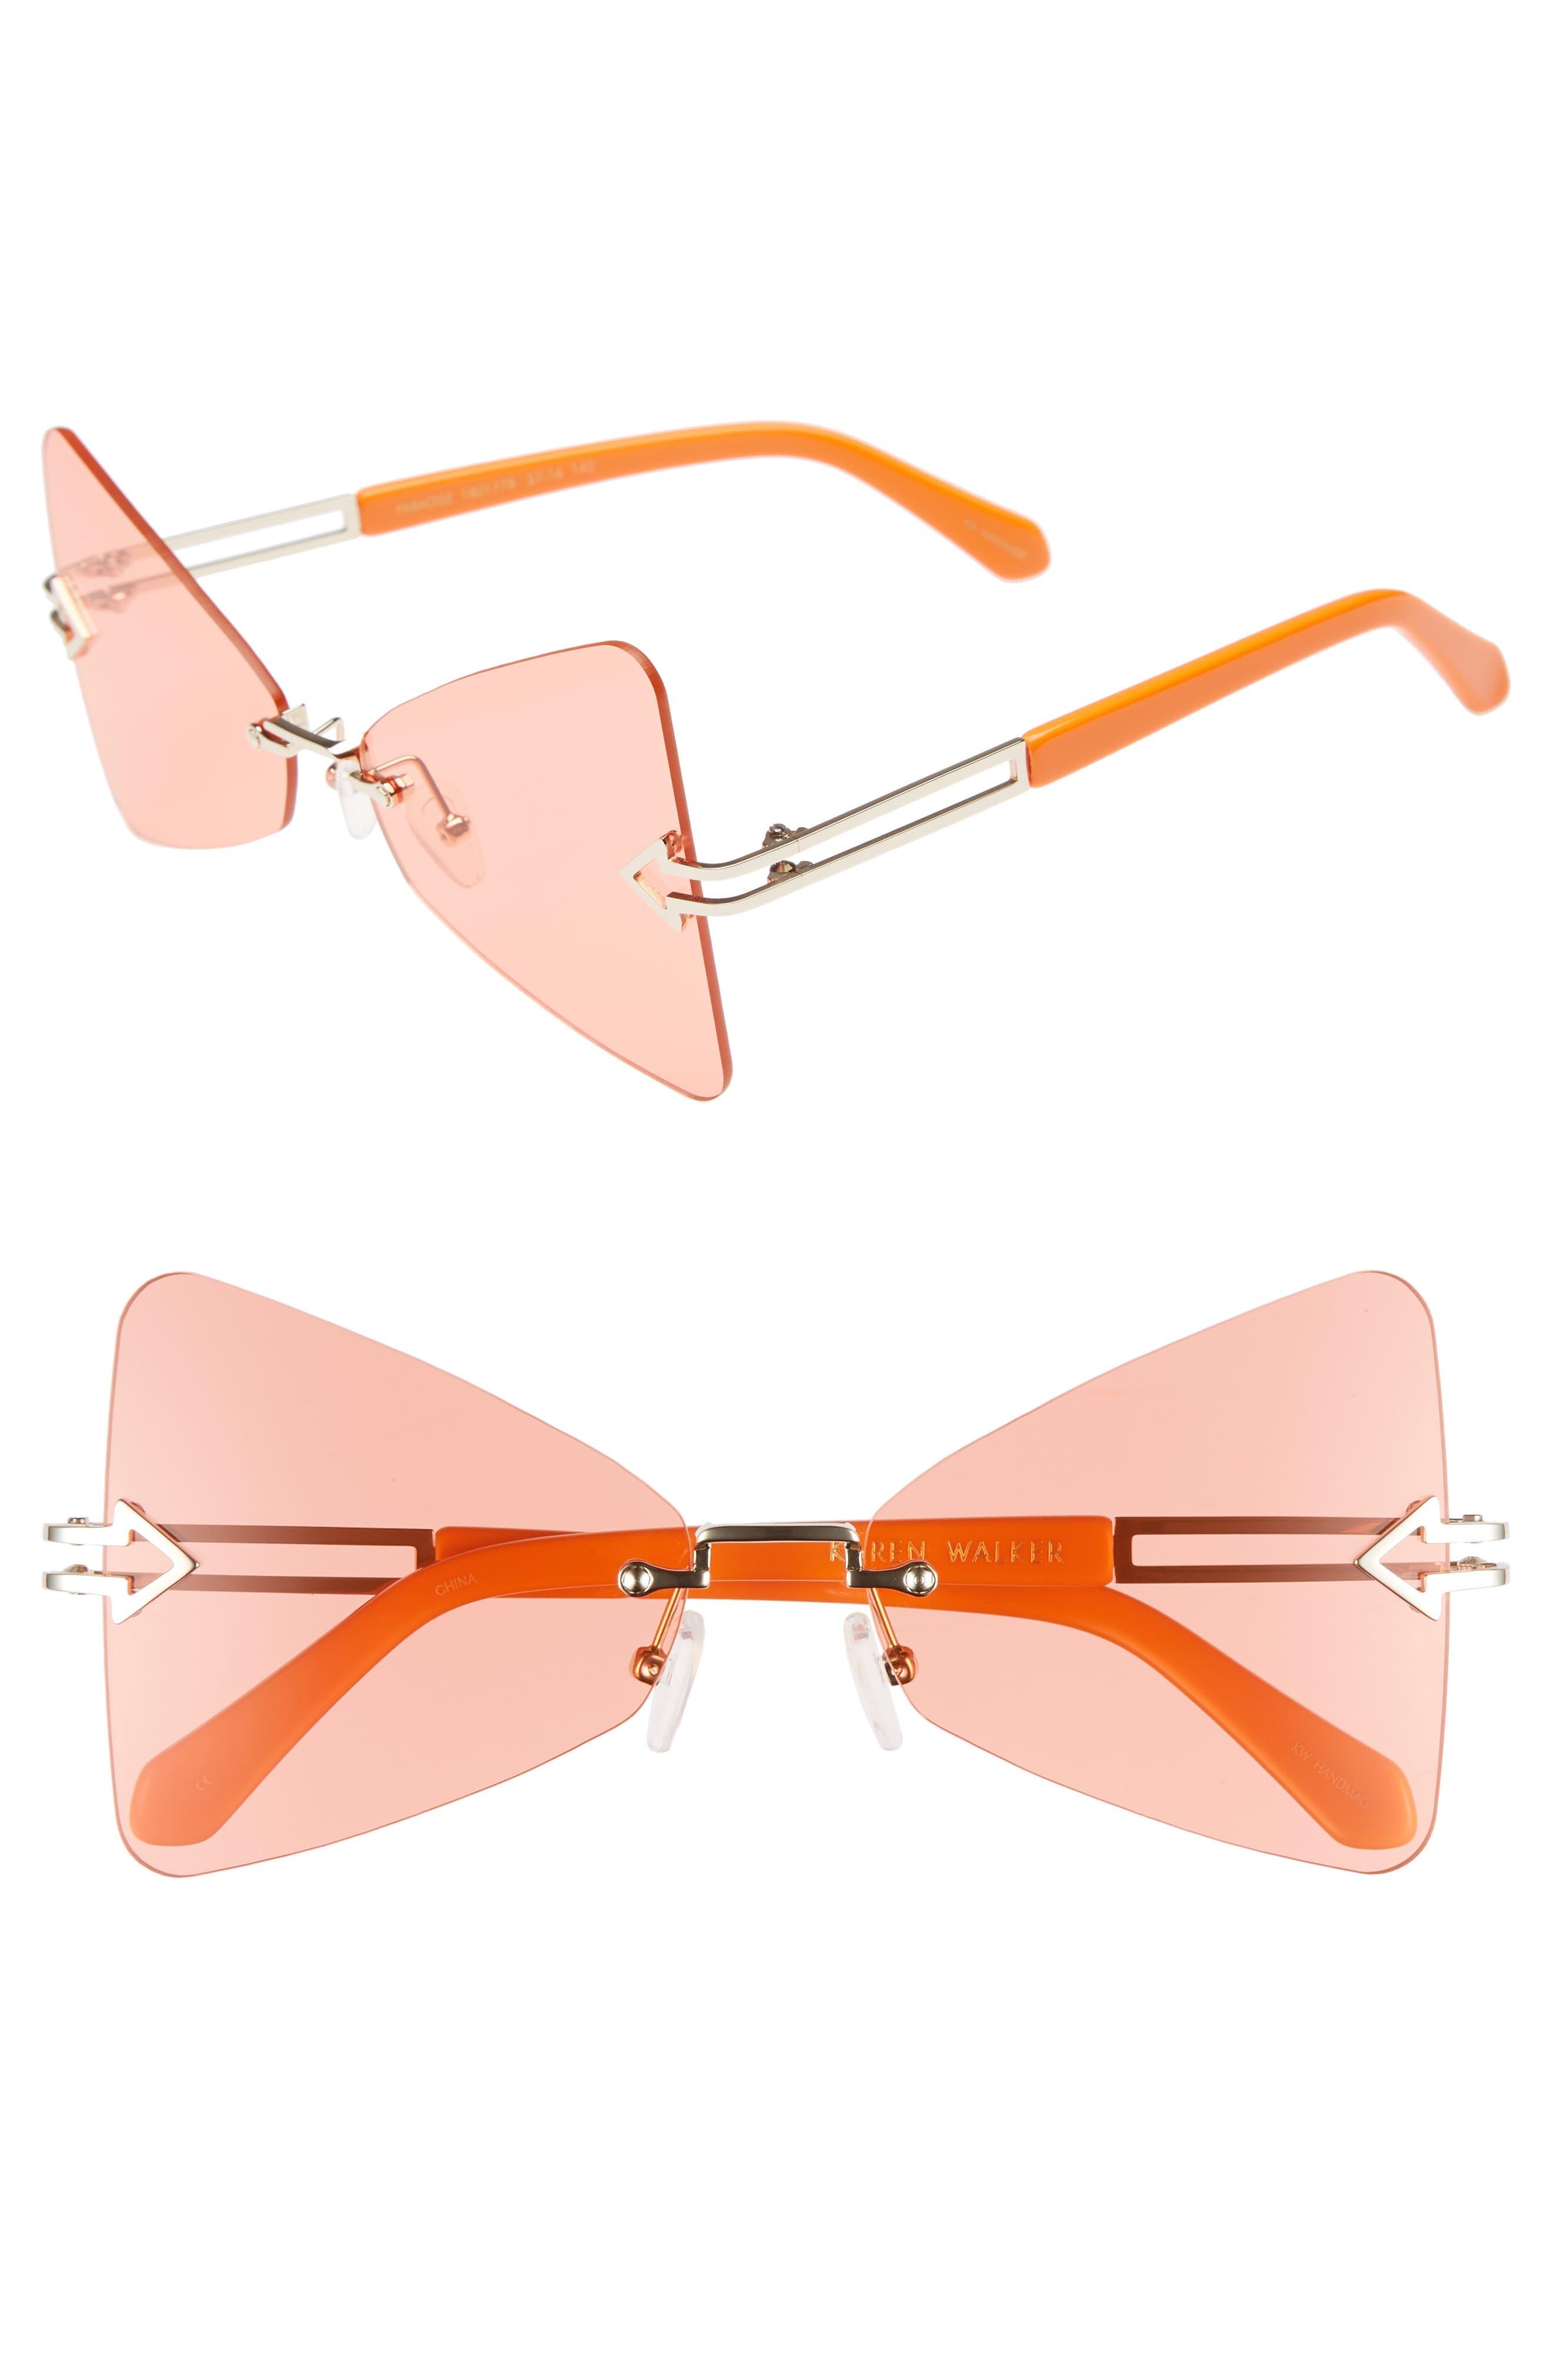 Paradise 57mm Sunglasses,                         Main,                         color, Tangerine/ Coral